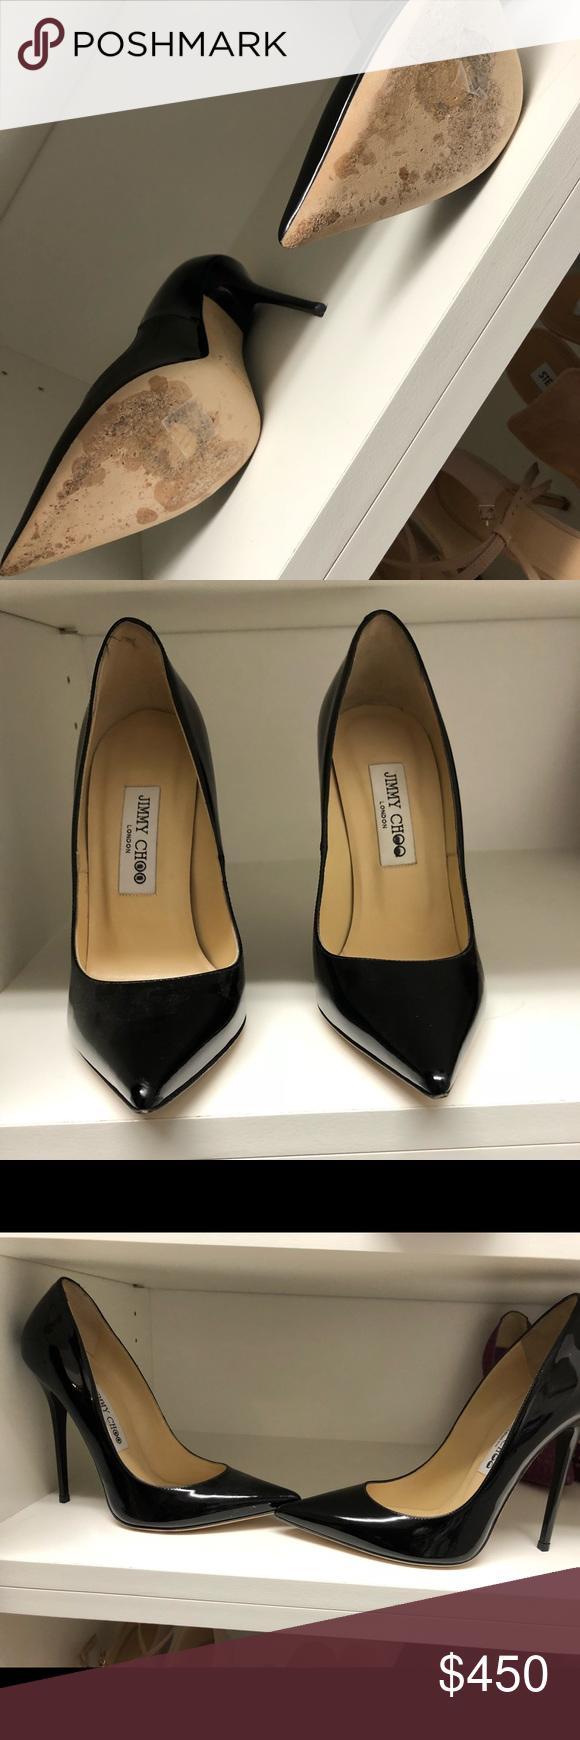 2716056ea5dd Jimmy Choo Anouk pumps black patent Black Patent leather Jimmy Choo Anouk  pumps Great condition Size 38 Jimmy Choo Shoes Heels